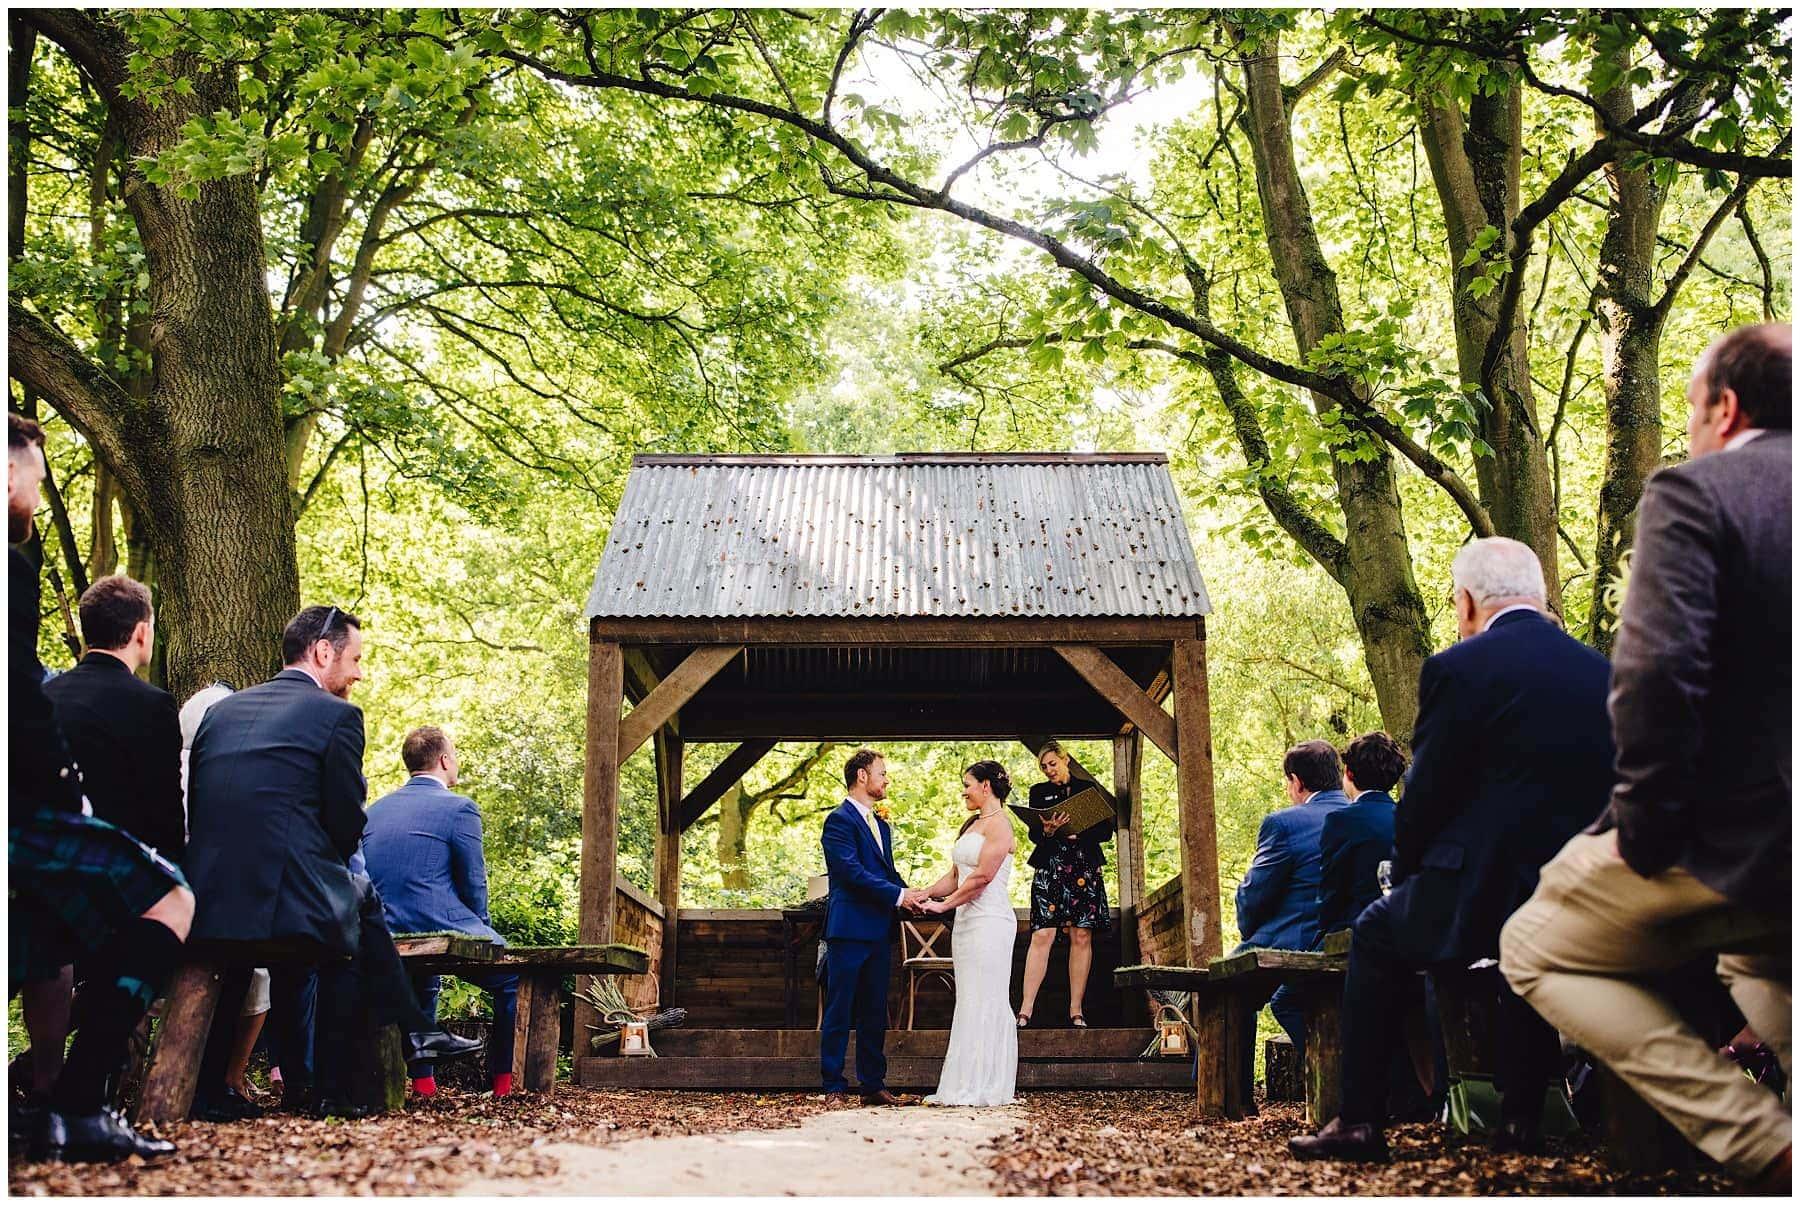 Hothorp Hall Woodlands Wedding Photographer 20